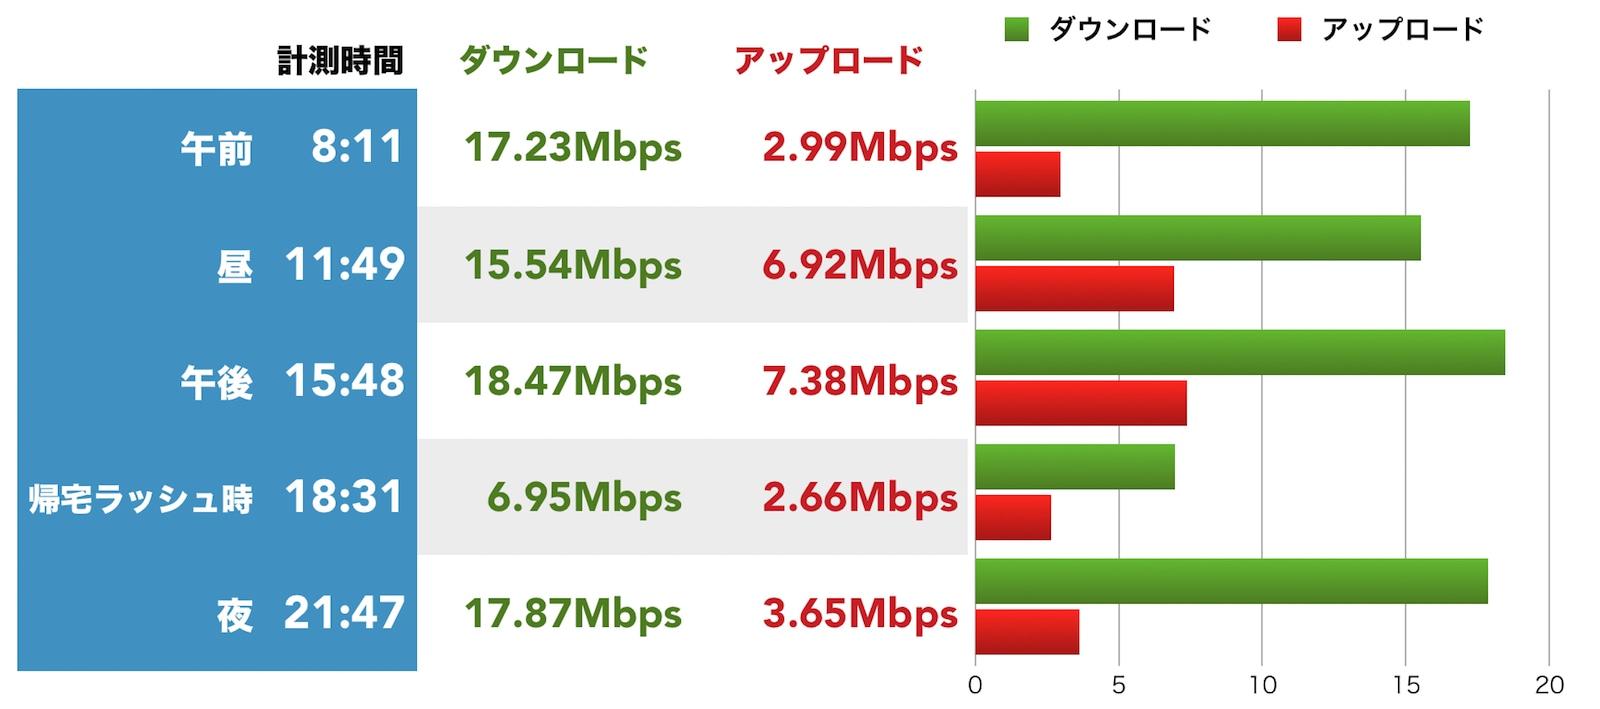 rakuten-mobile-speed-graph